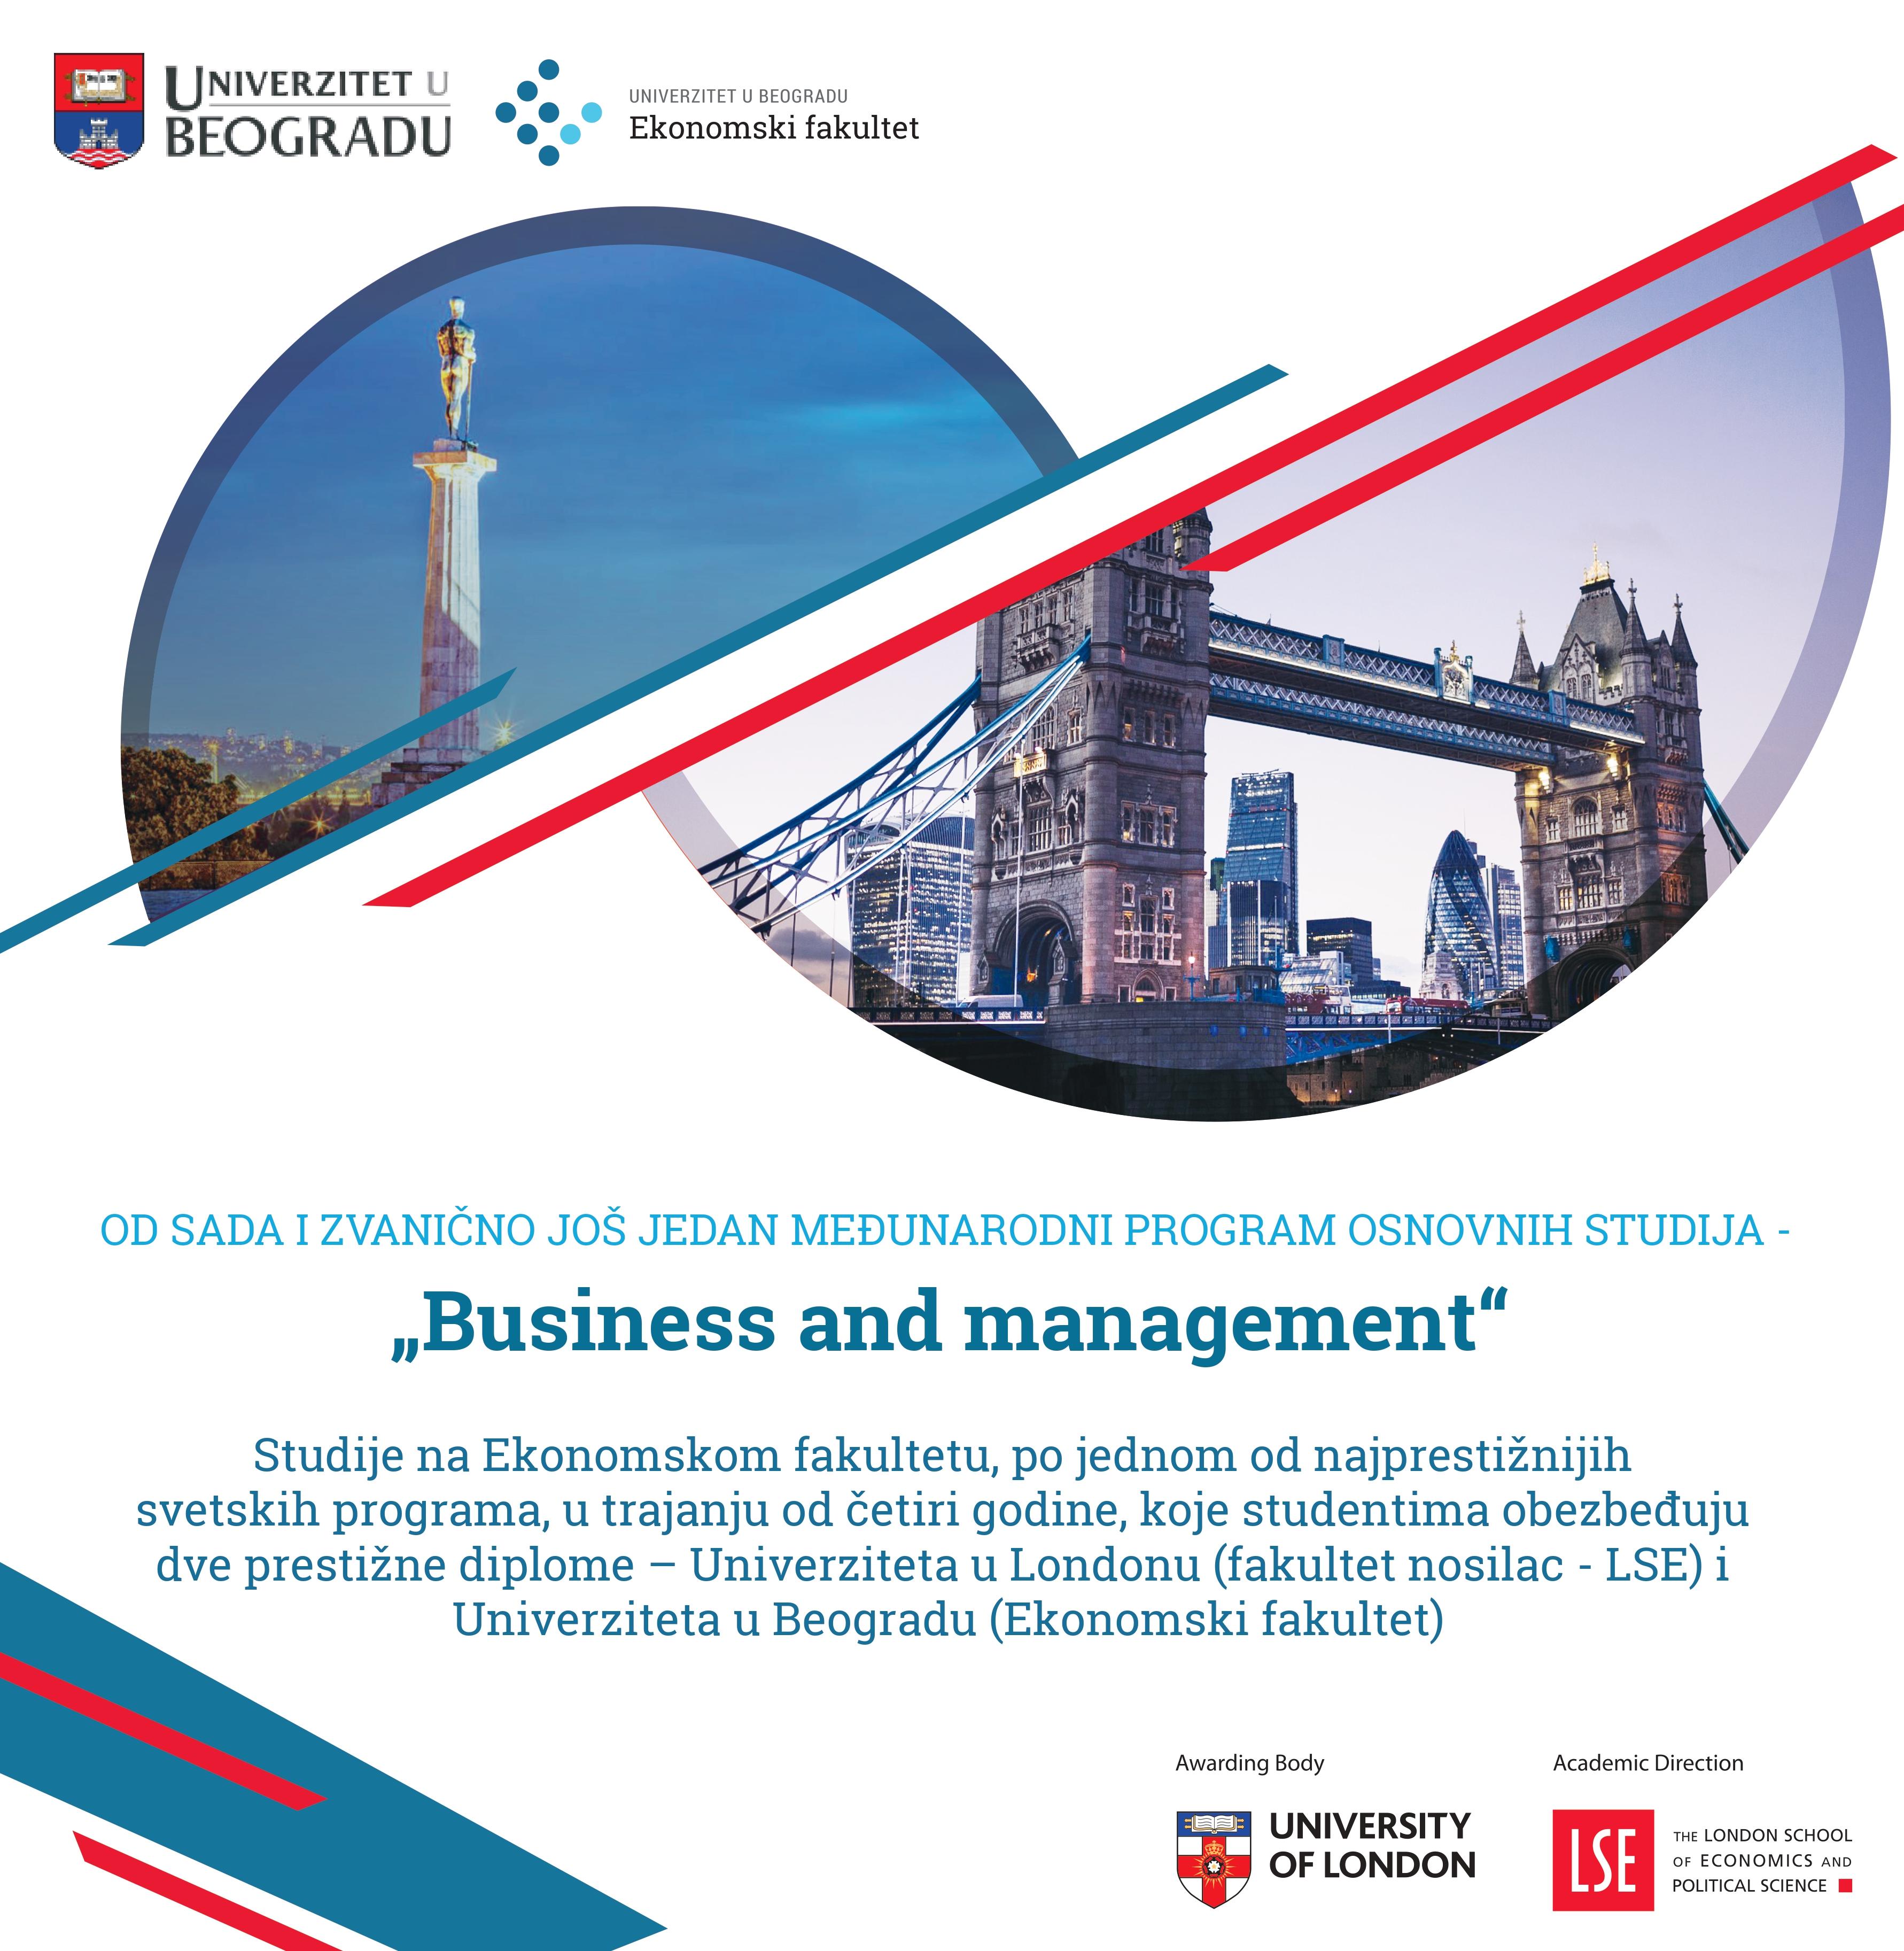 lse business and managment 07.03. NEW vizual za drustvene mreze _page-0001 (3)